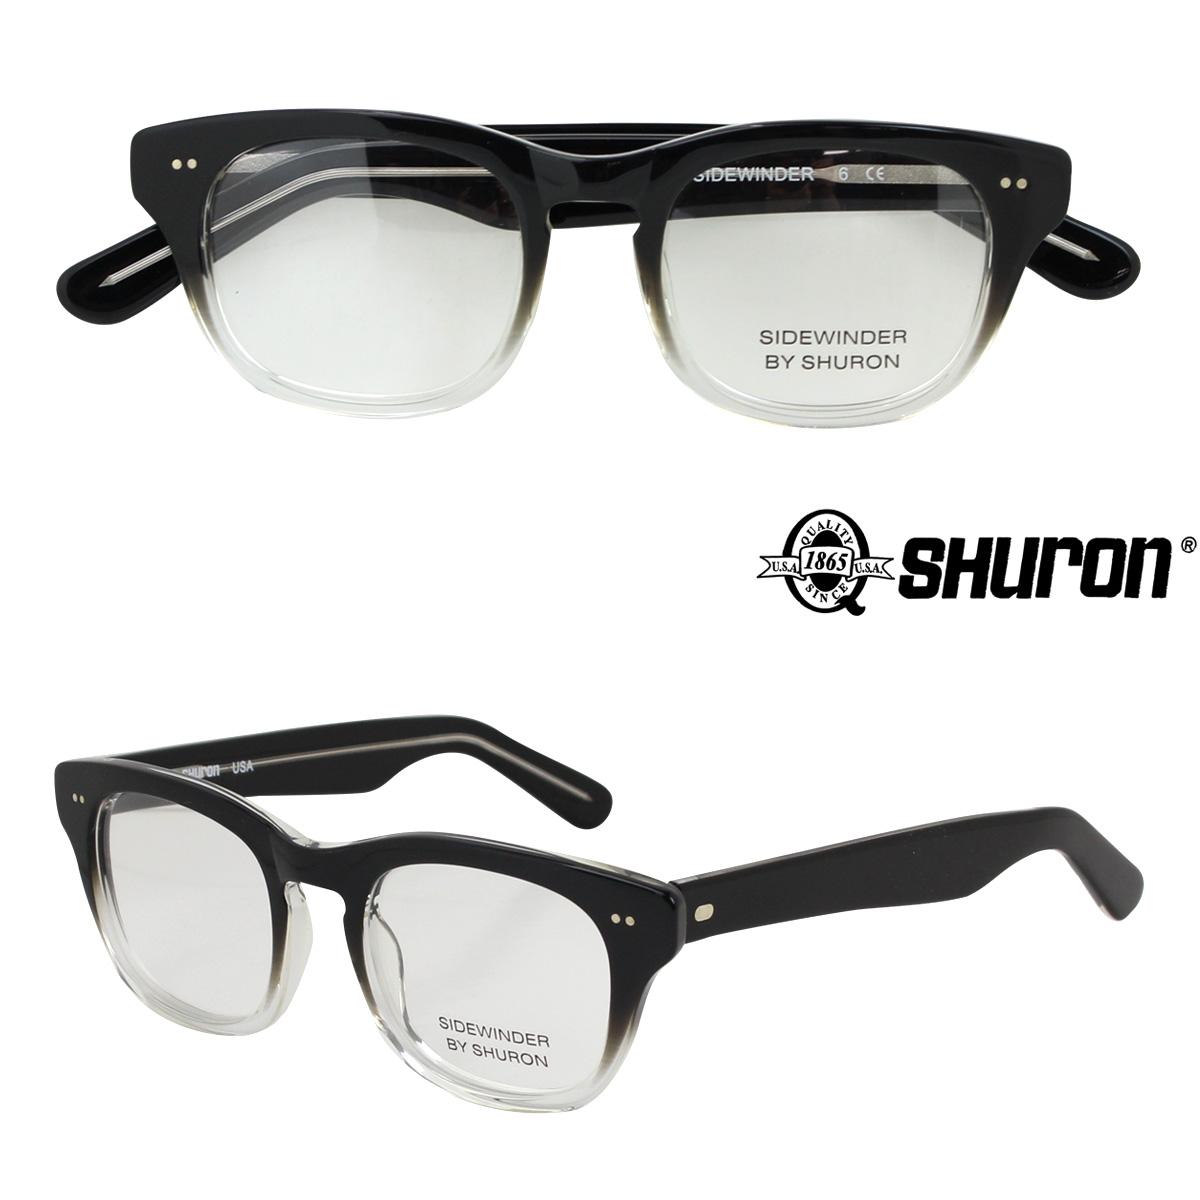 Sugar Online Shop | Rakuten Global Market: [SOLD OUT] Shawn SHURON ...